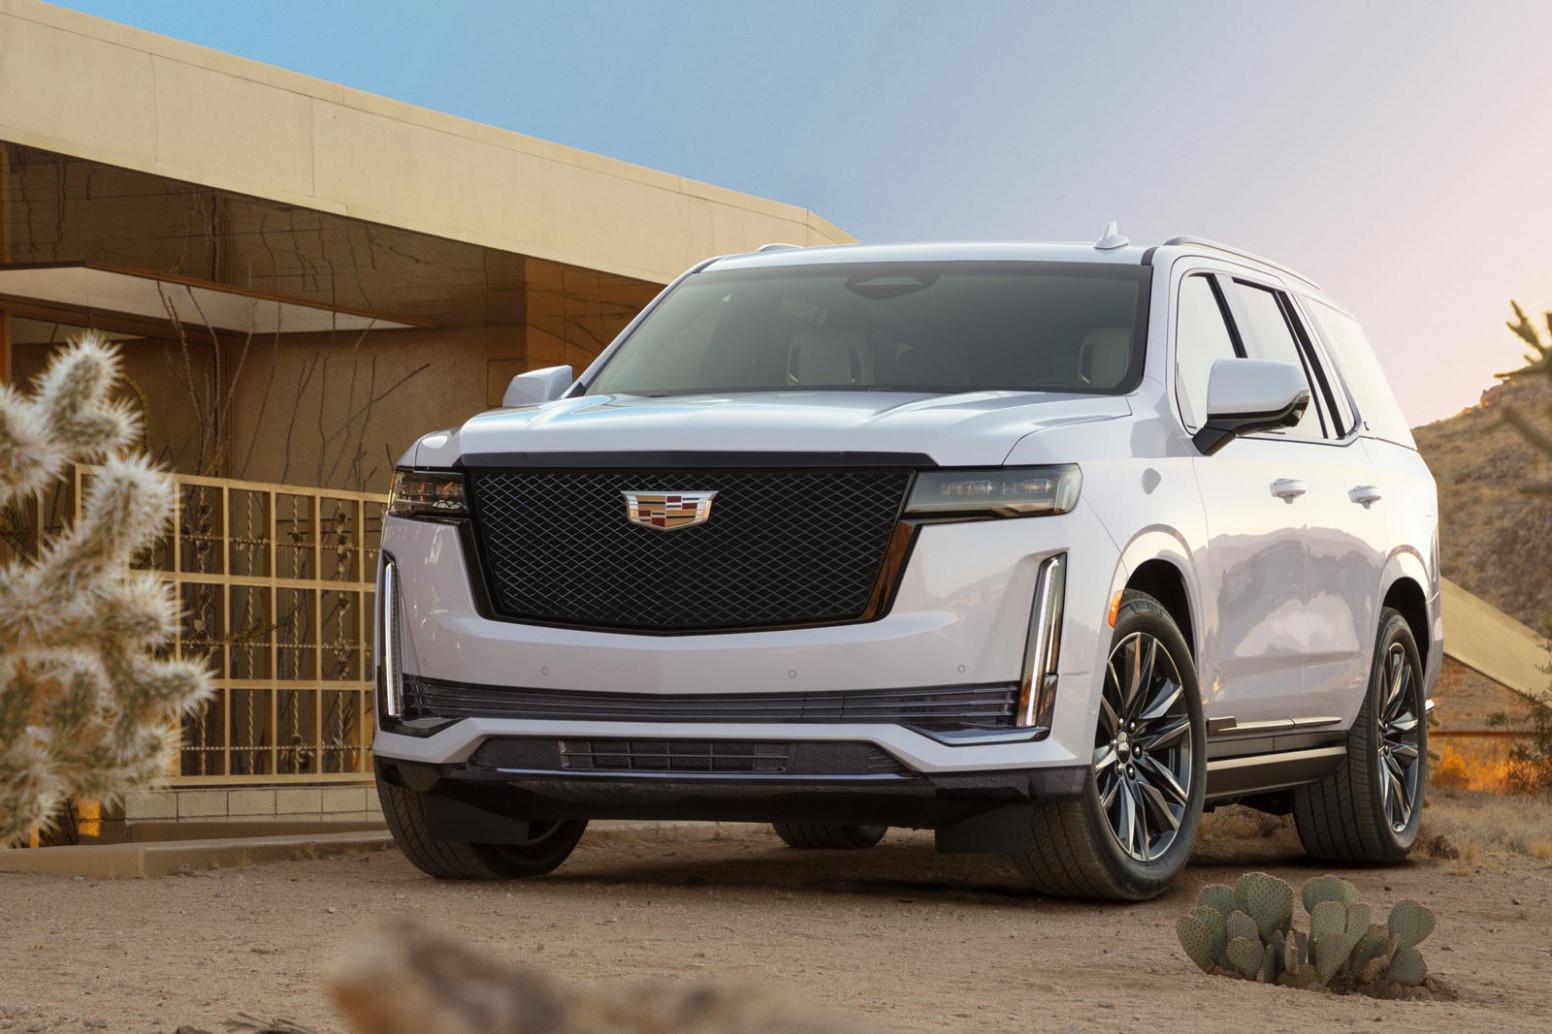 Interior Build 2022 Cadillac Escalade